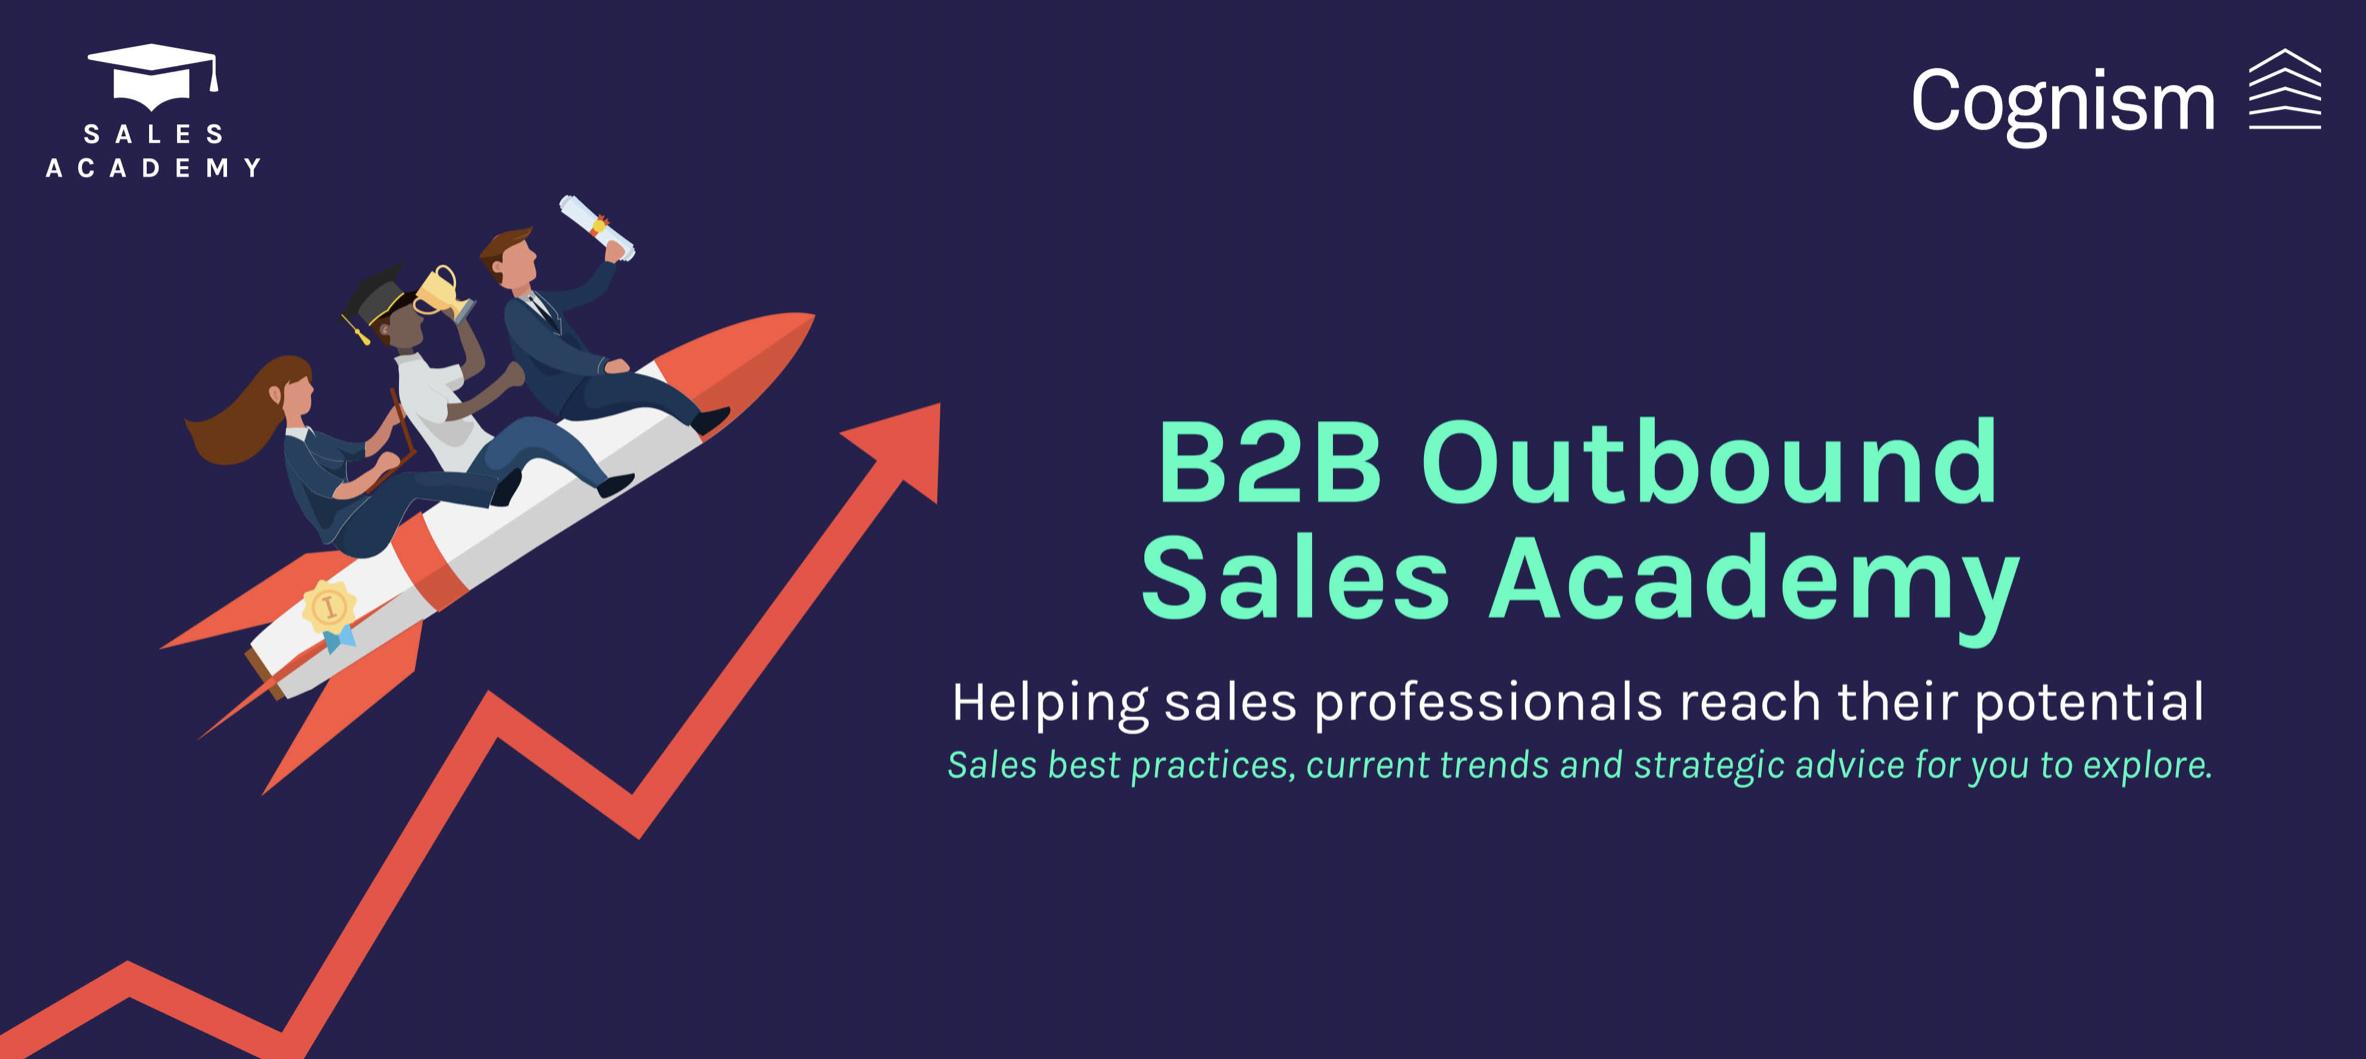 B2B_Outbound_Sales_Academy